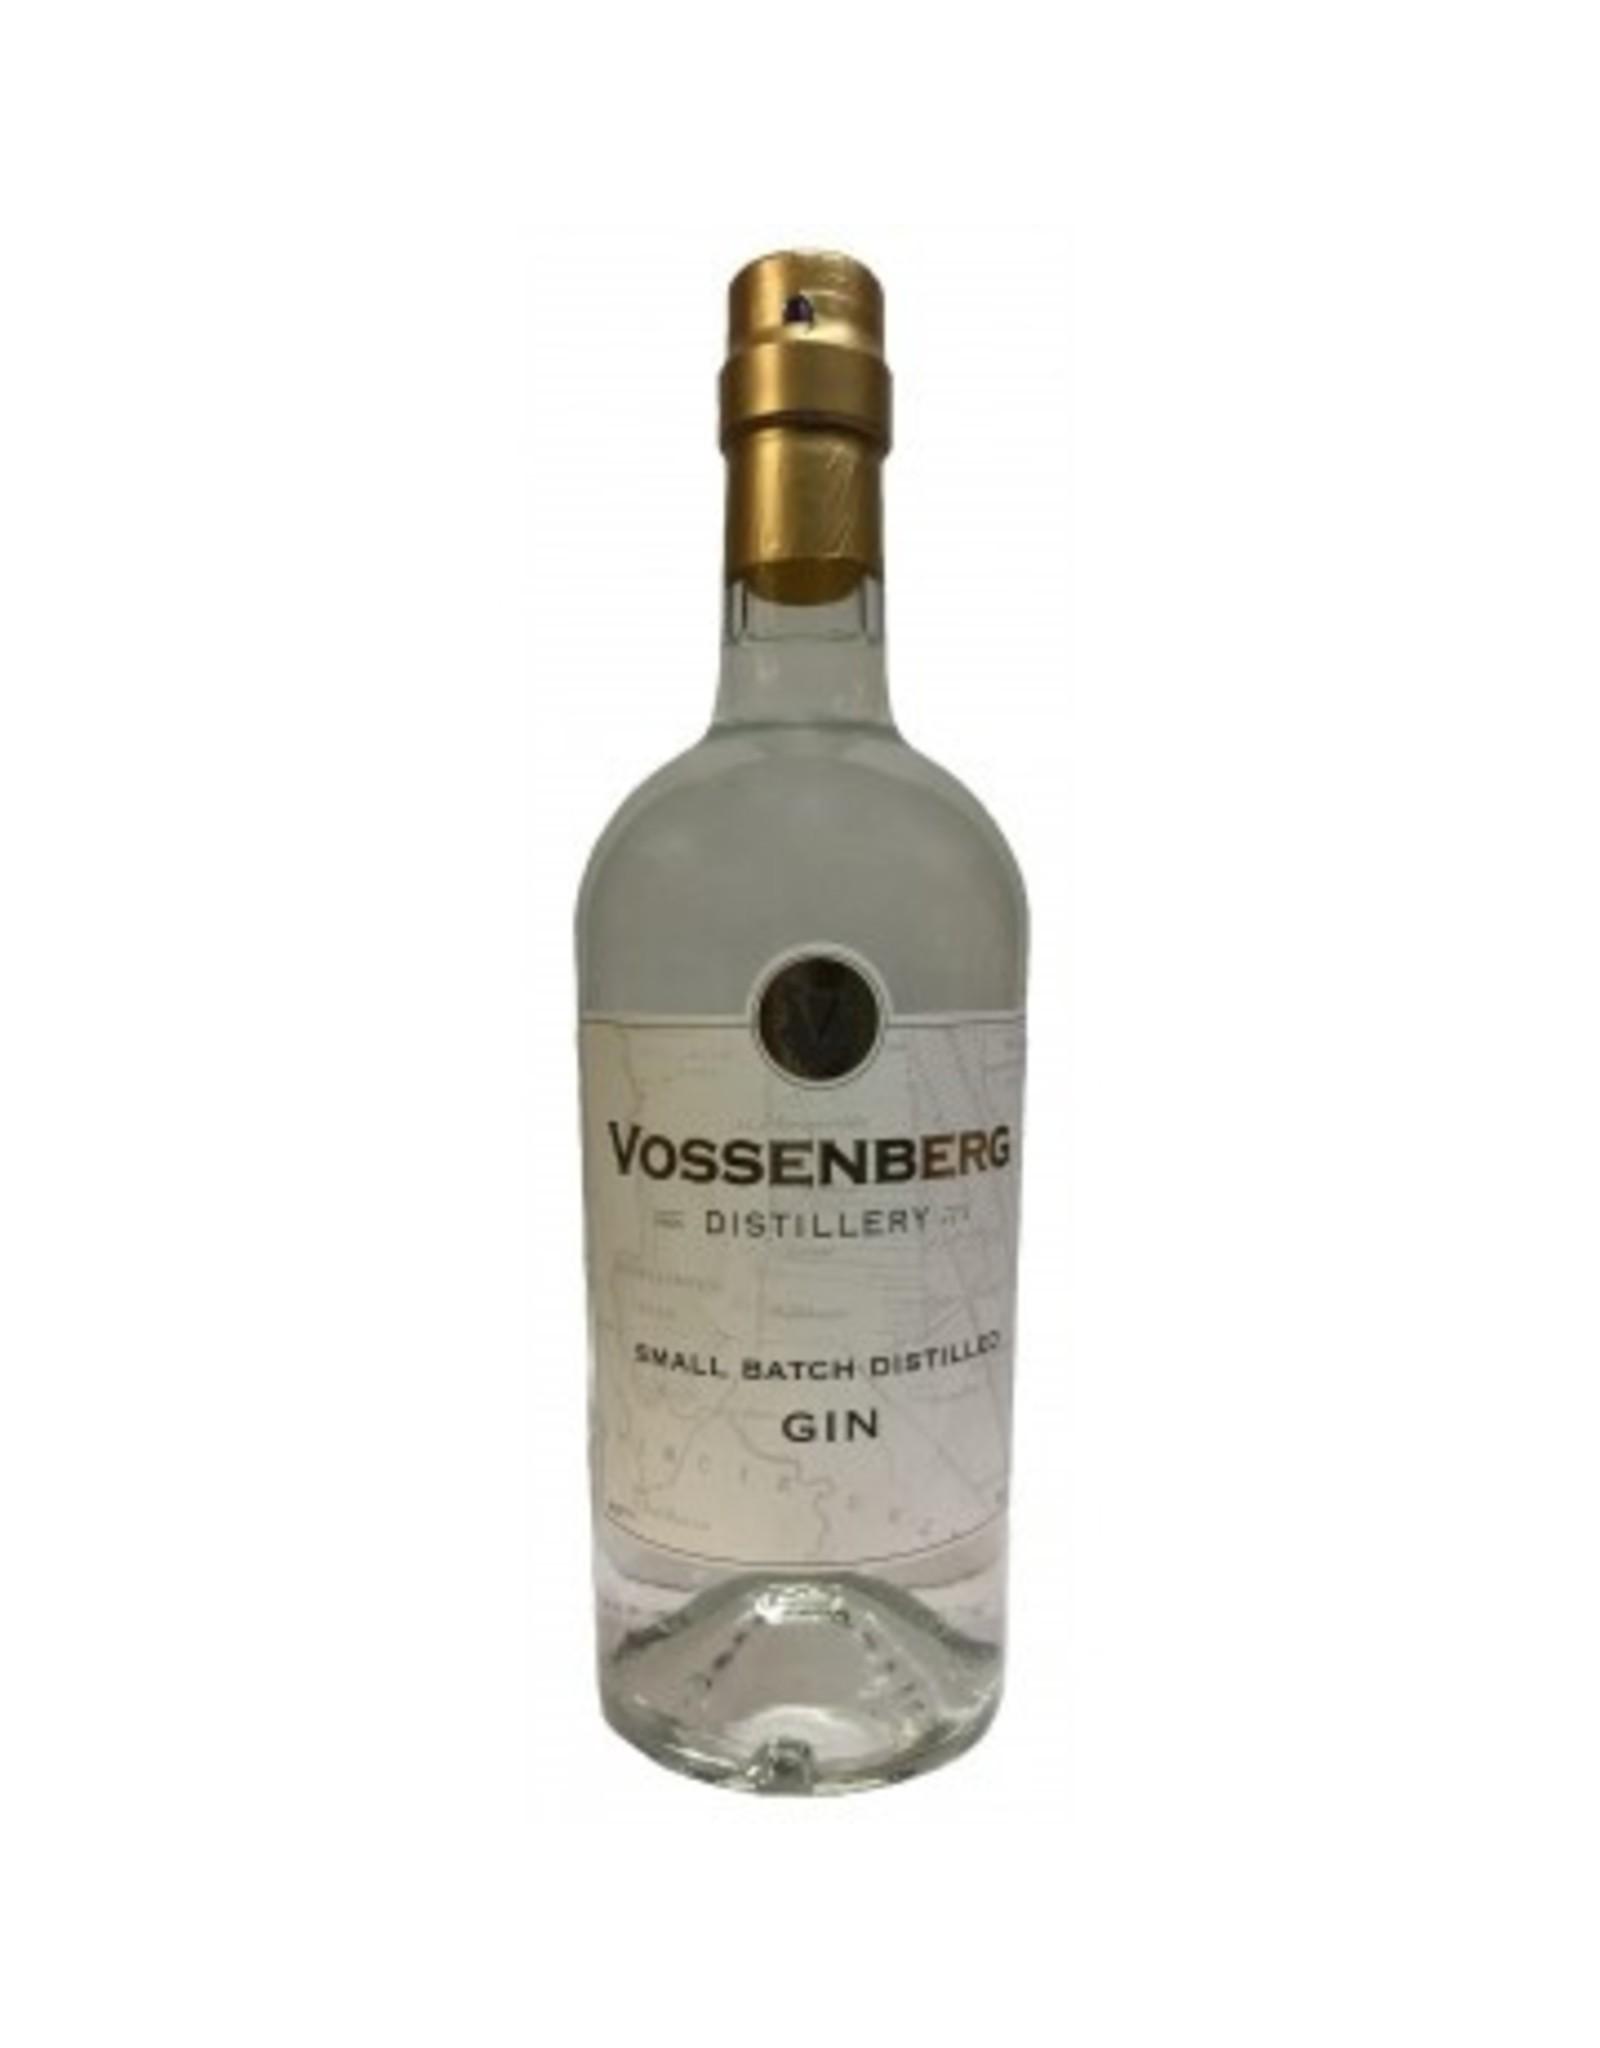 Vossenberg Vossenberg Small Batch Distilled Gin 70cl